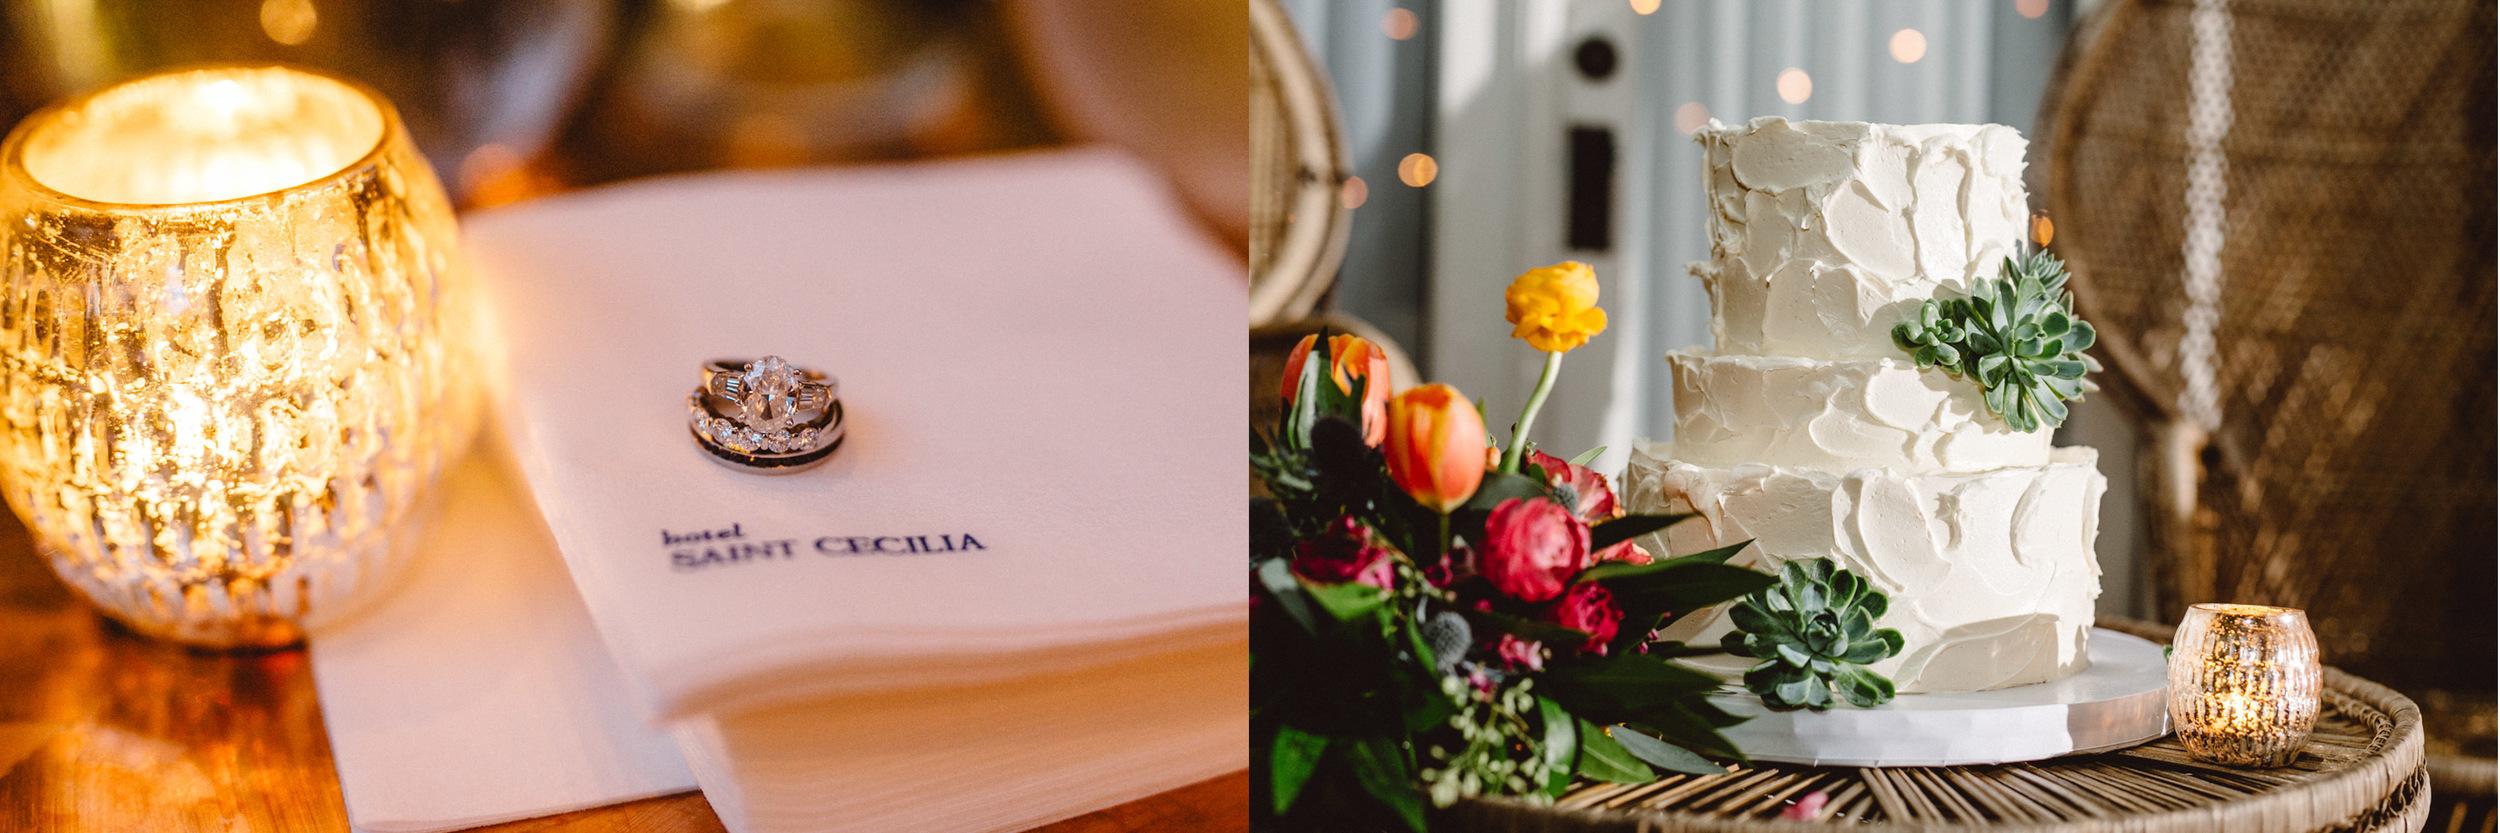 hotel st. cecelia wedding 17.jpg